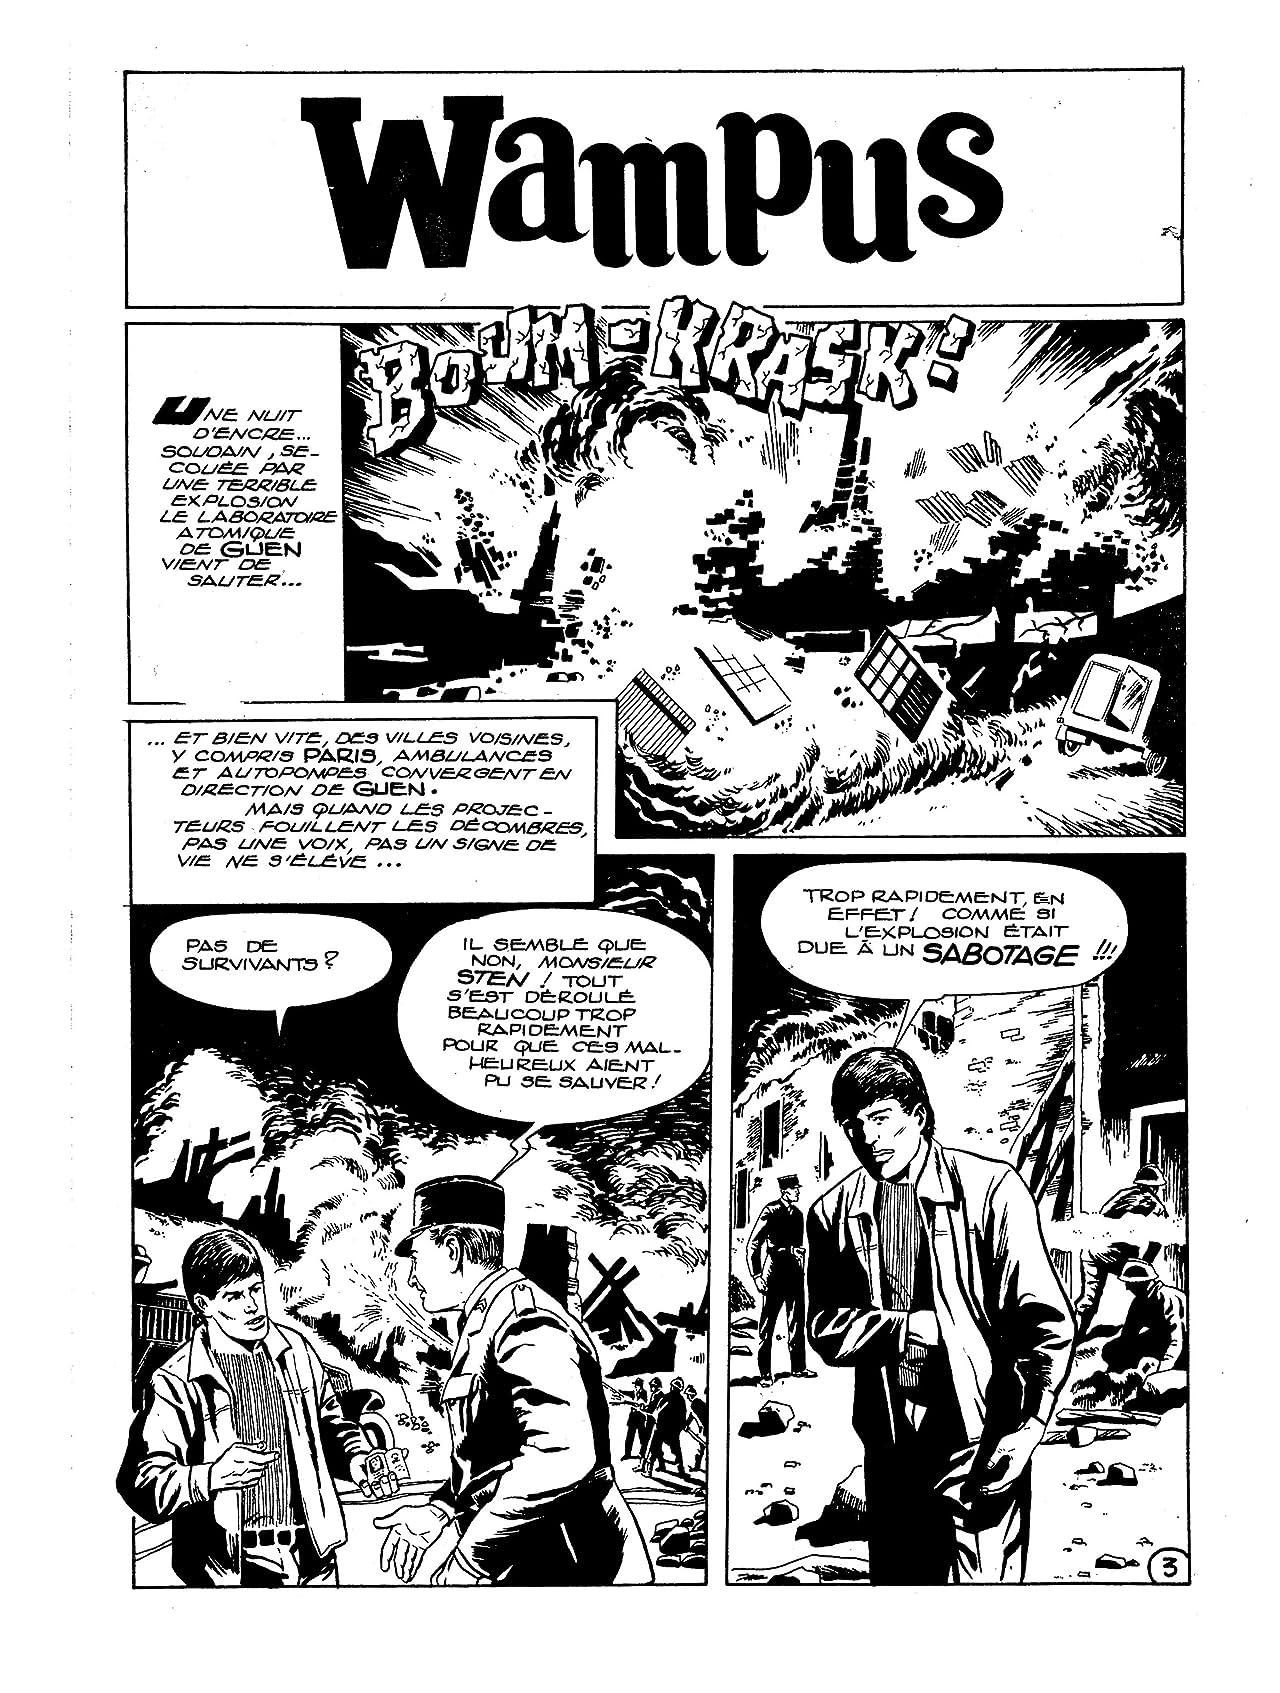 WAMPUS Vol. 1: La Mort vient des étoiles